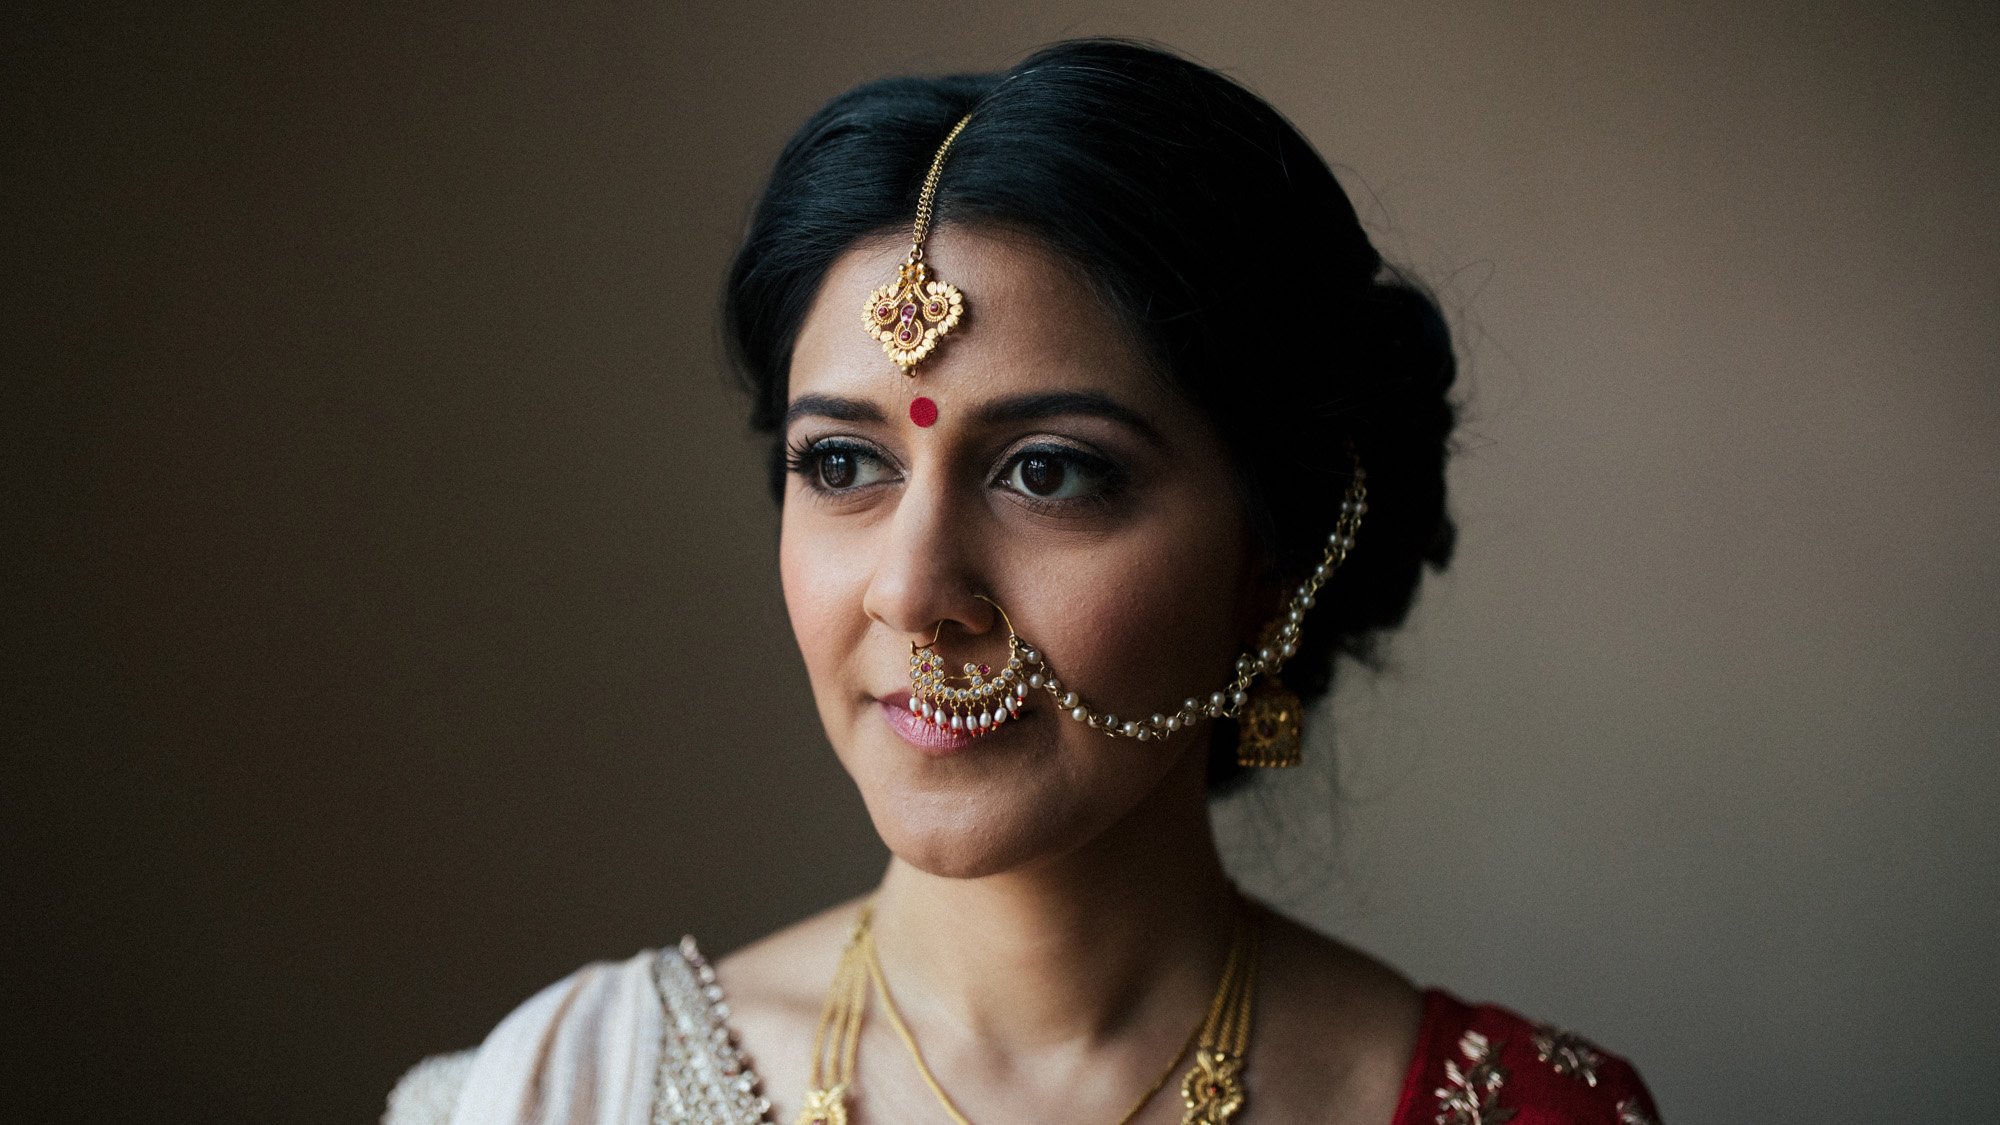 anu_maneesh_alec_vanderboom_Indian_wedding_photography-0055.jpg